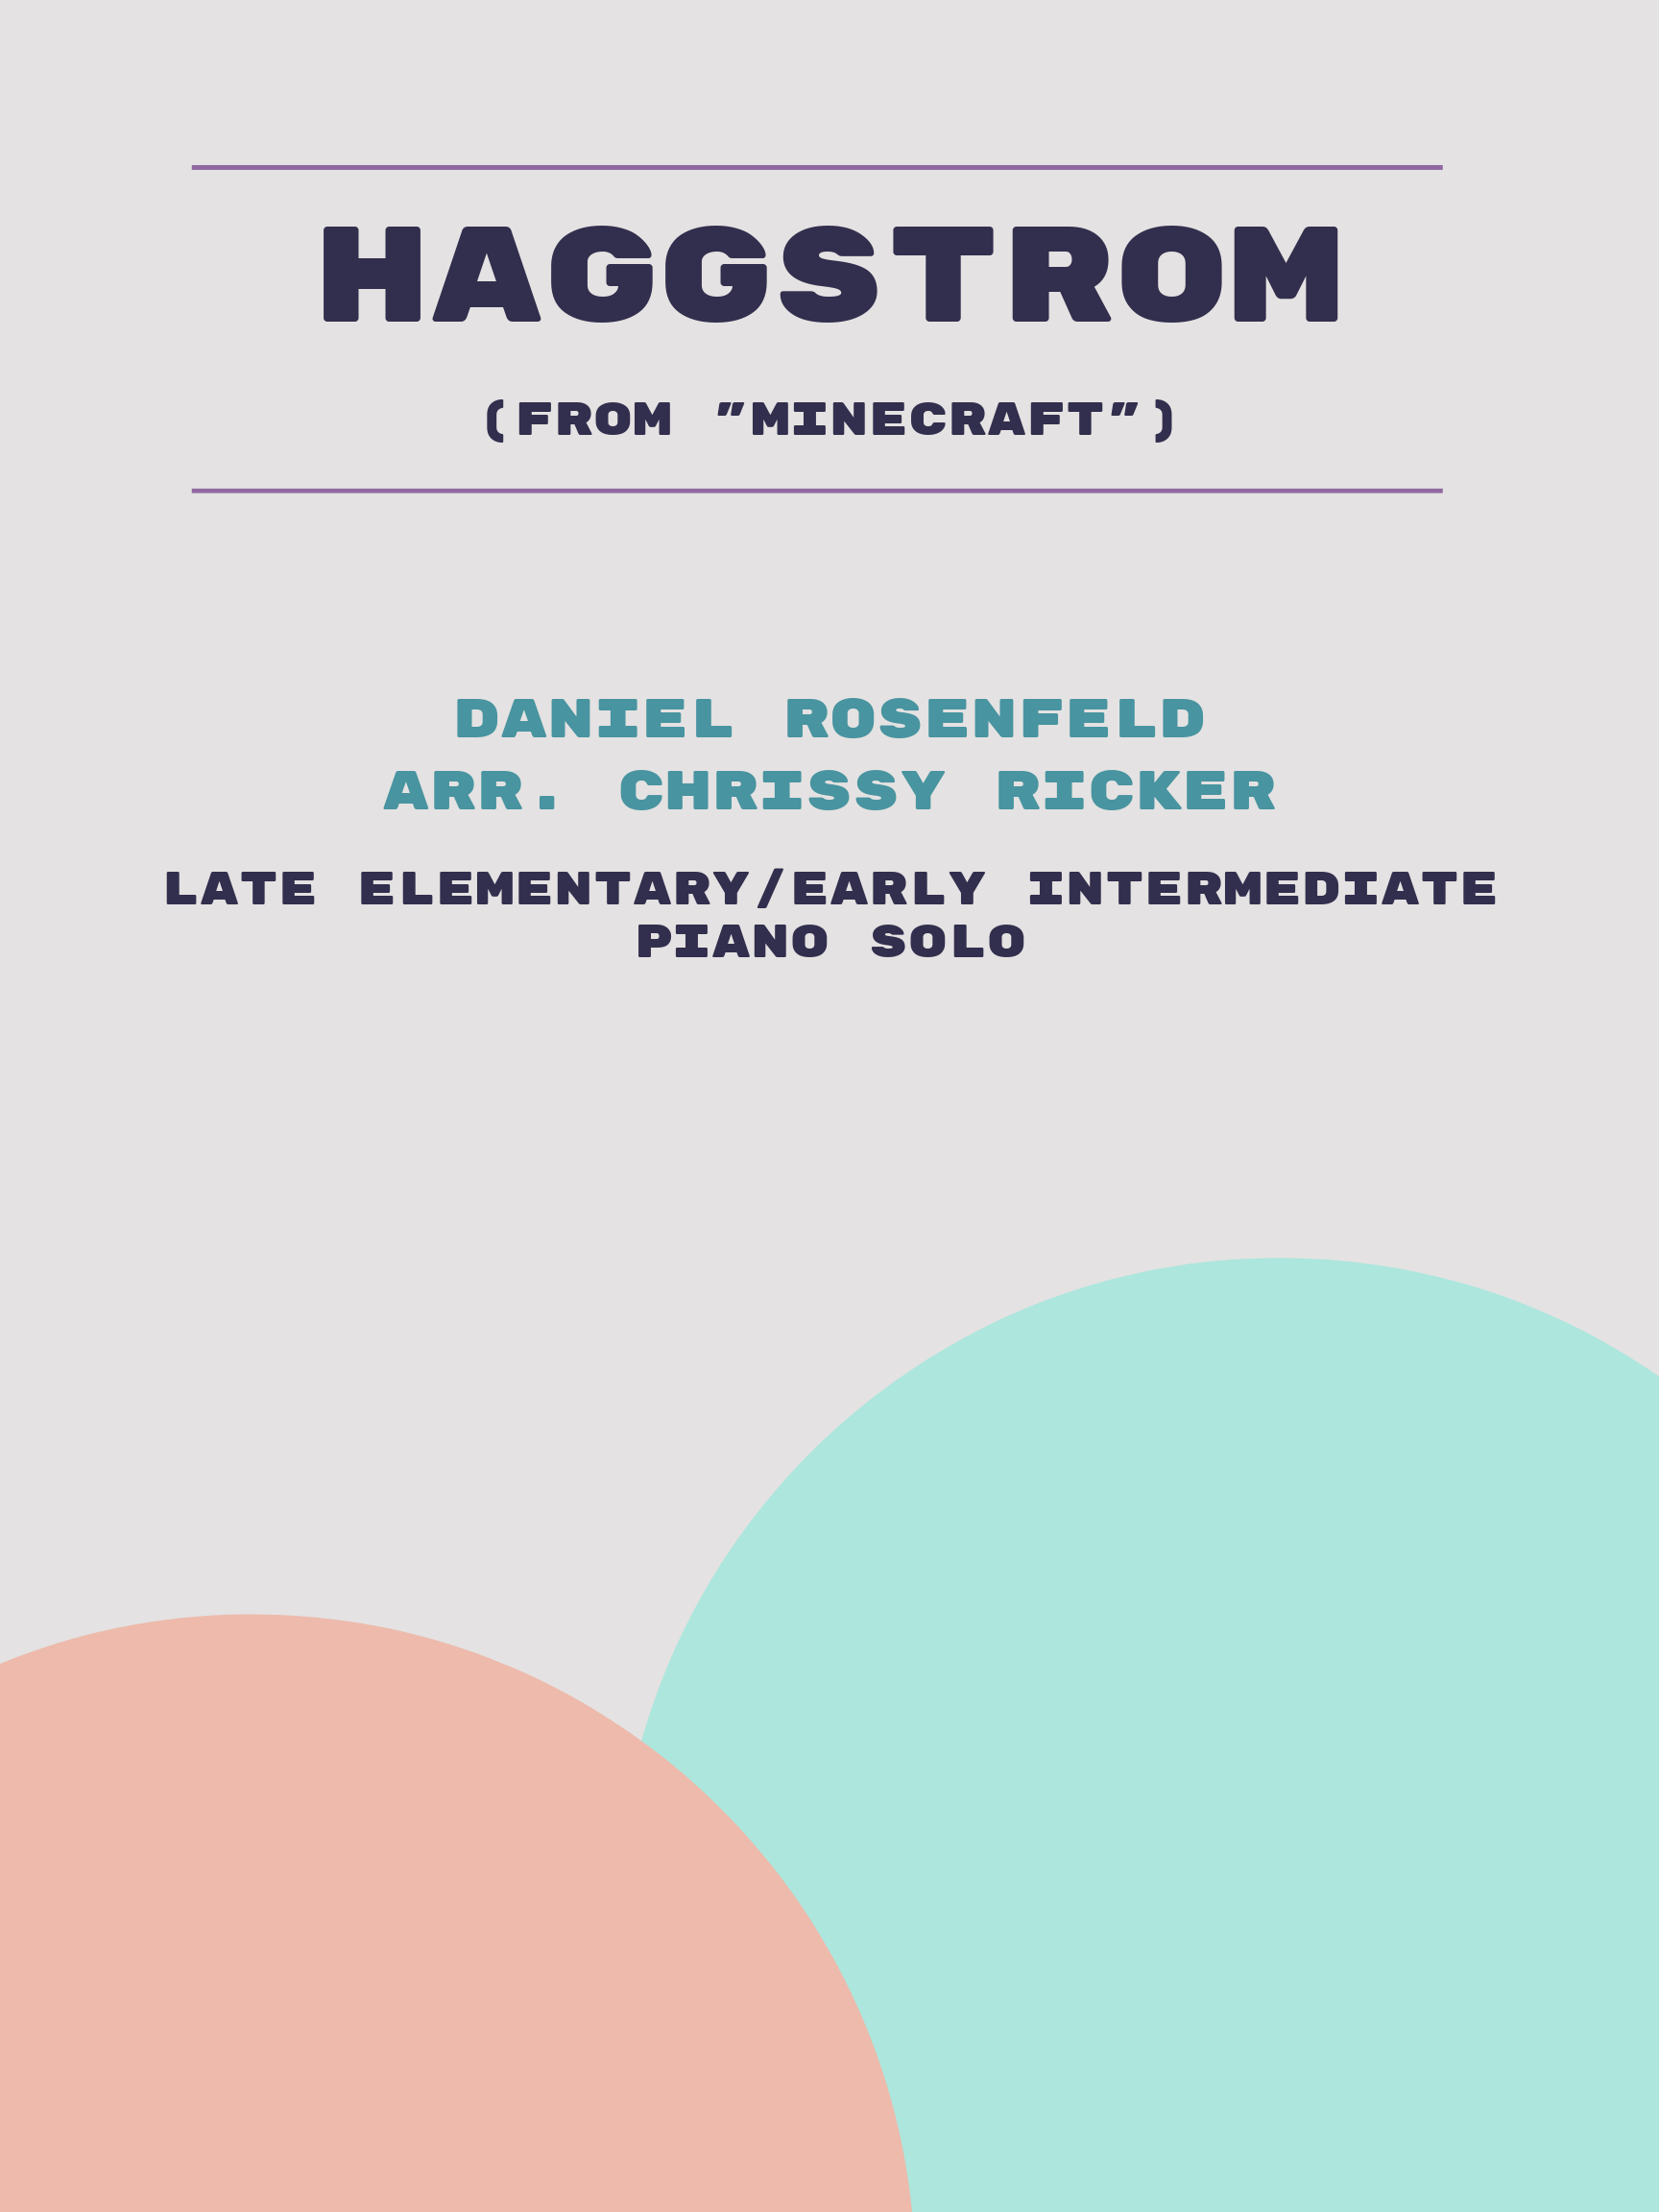 Haggstrom by Daniel Rosenfeld